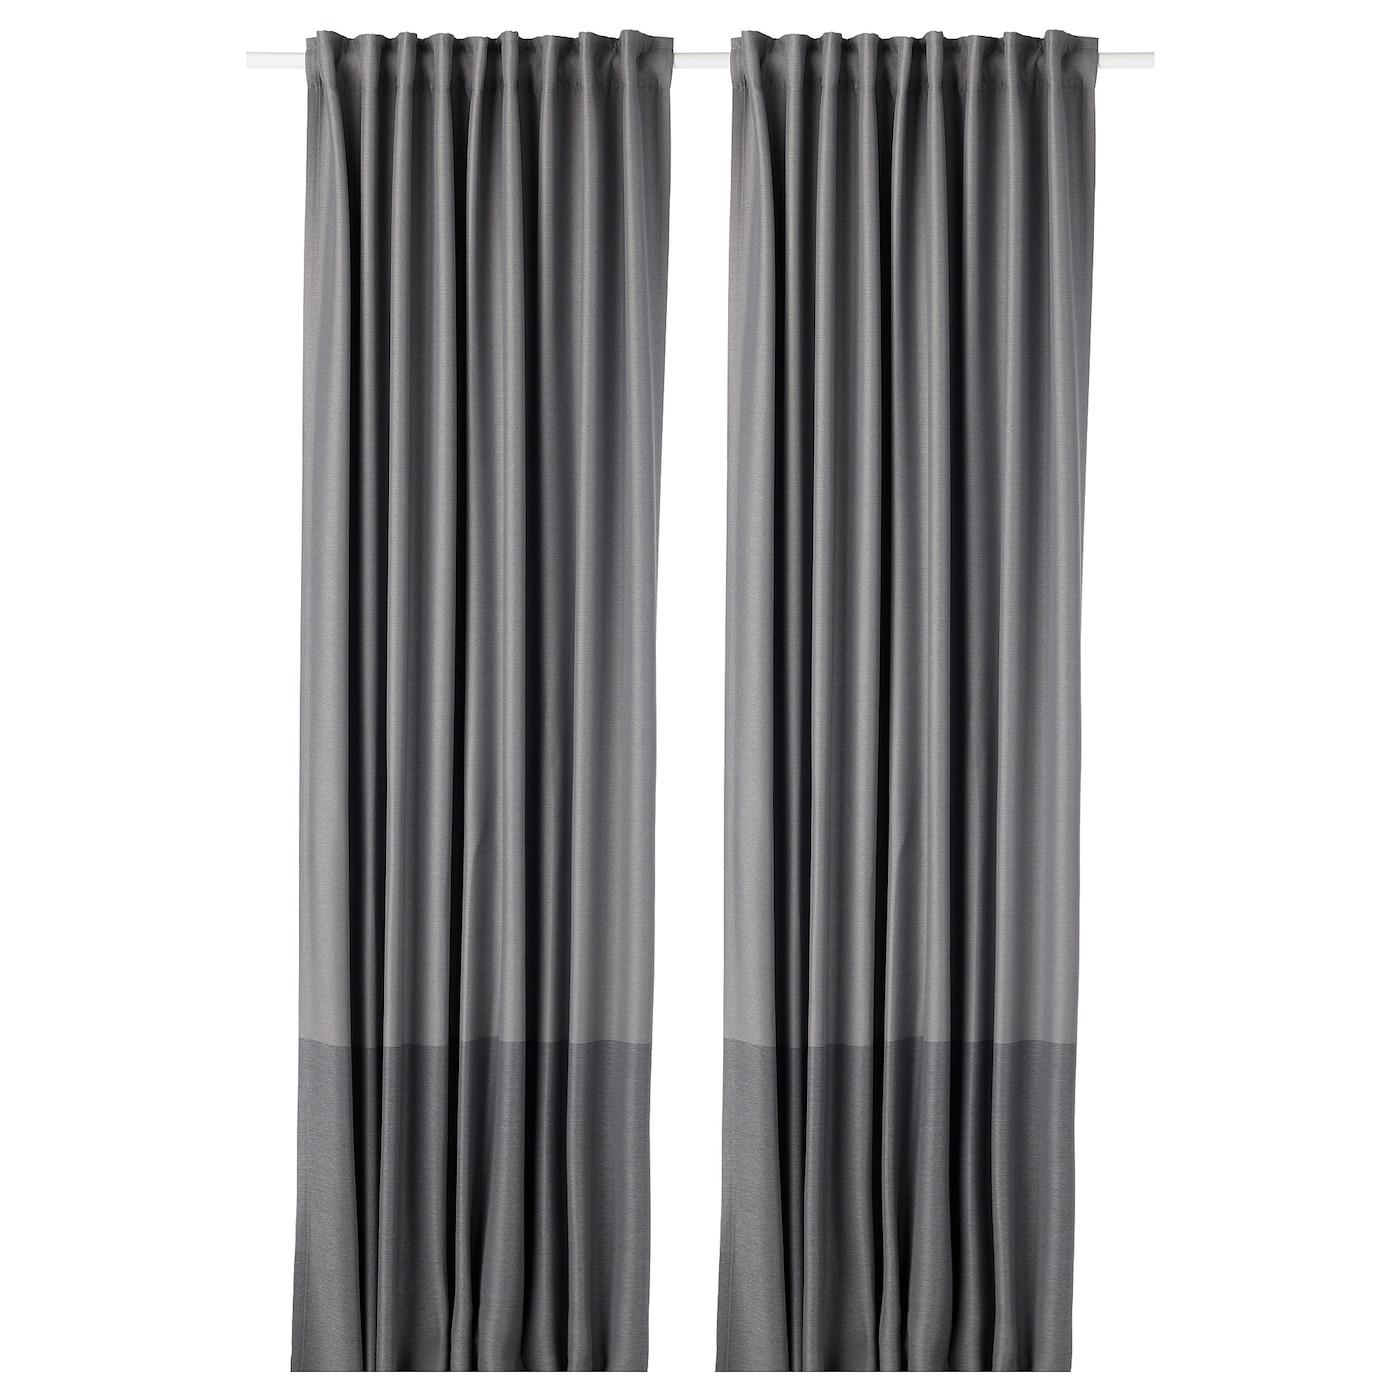 Marjun Blackout Curtains 1 Pair Gray